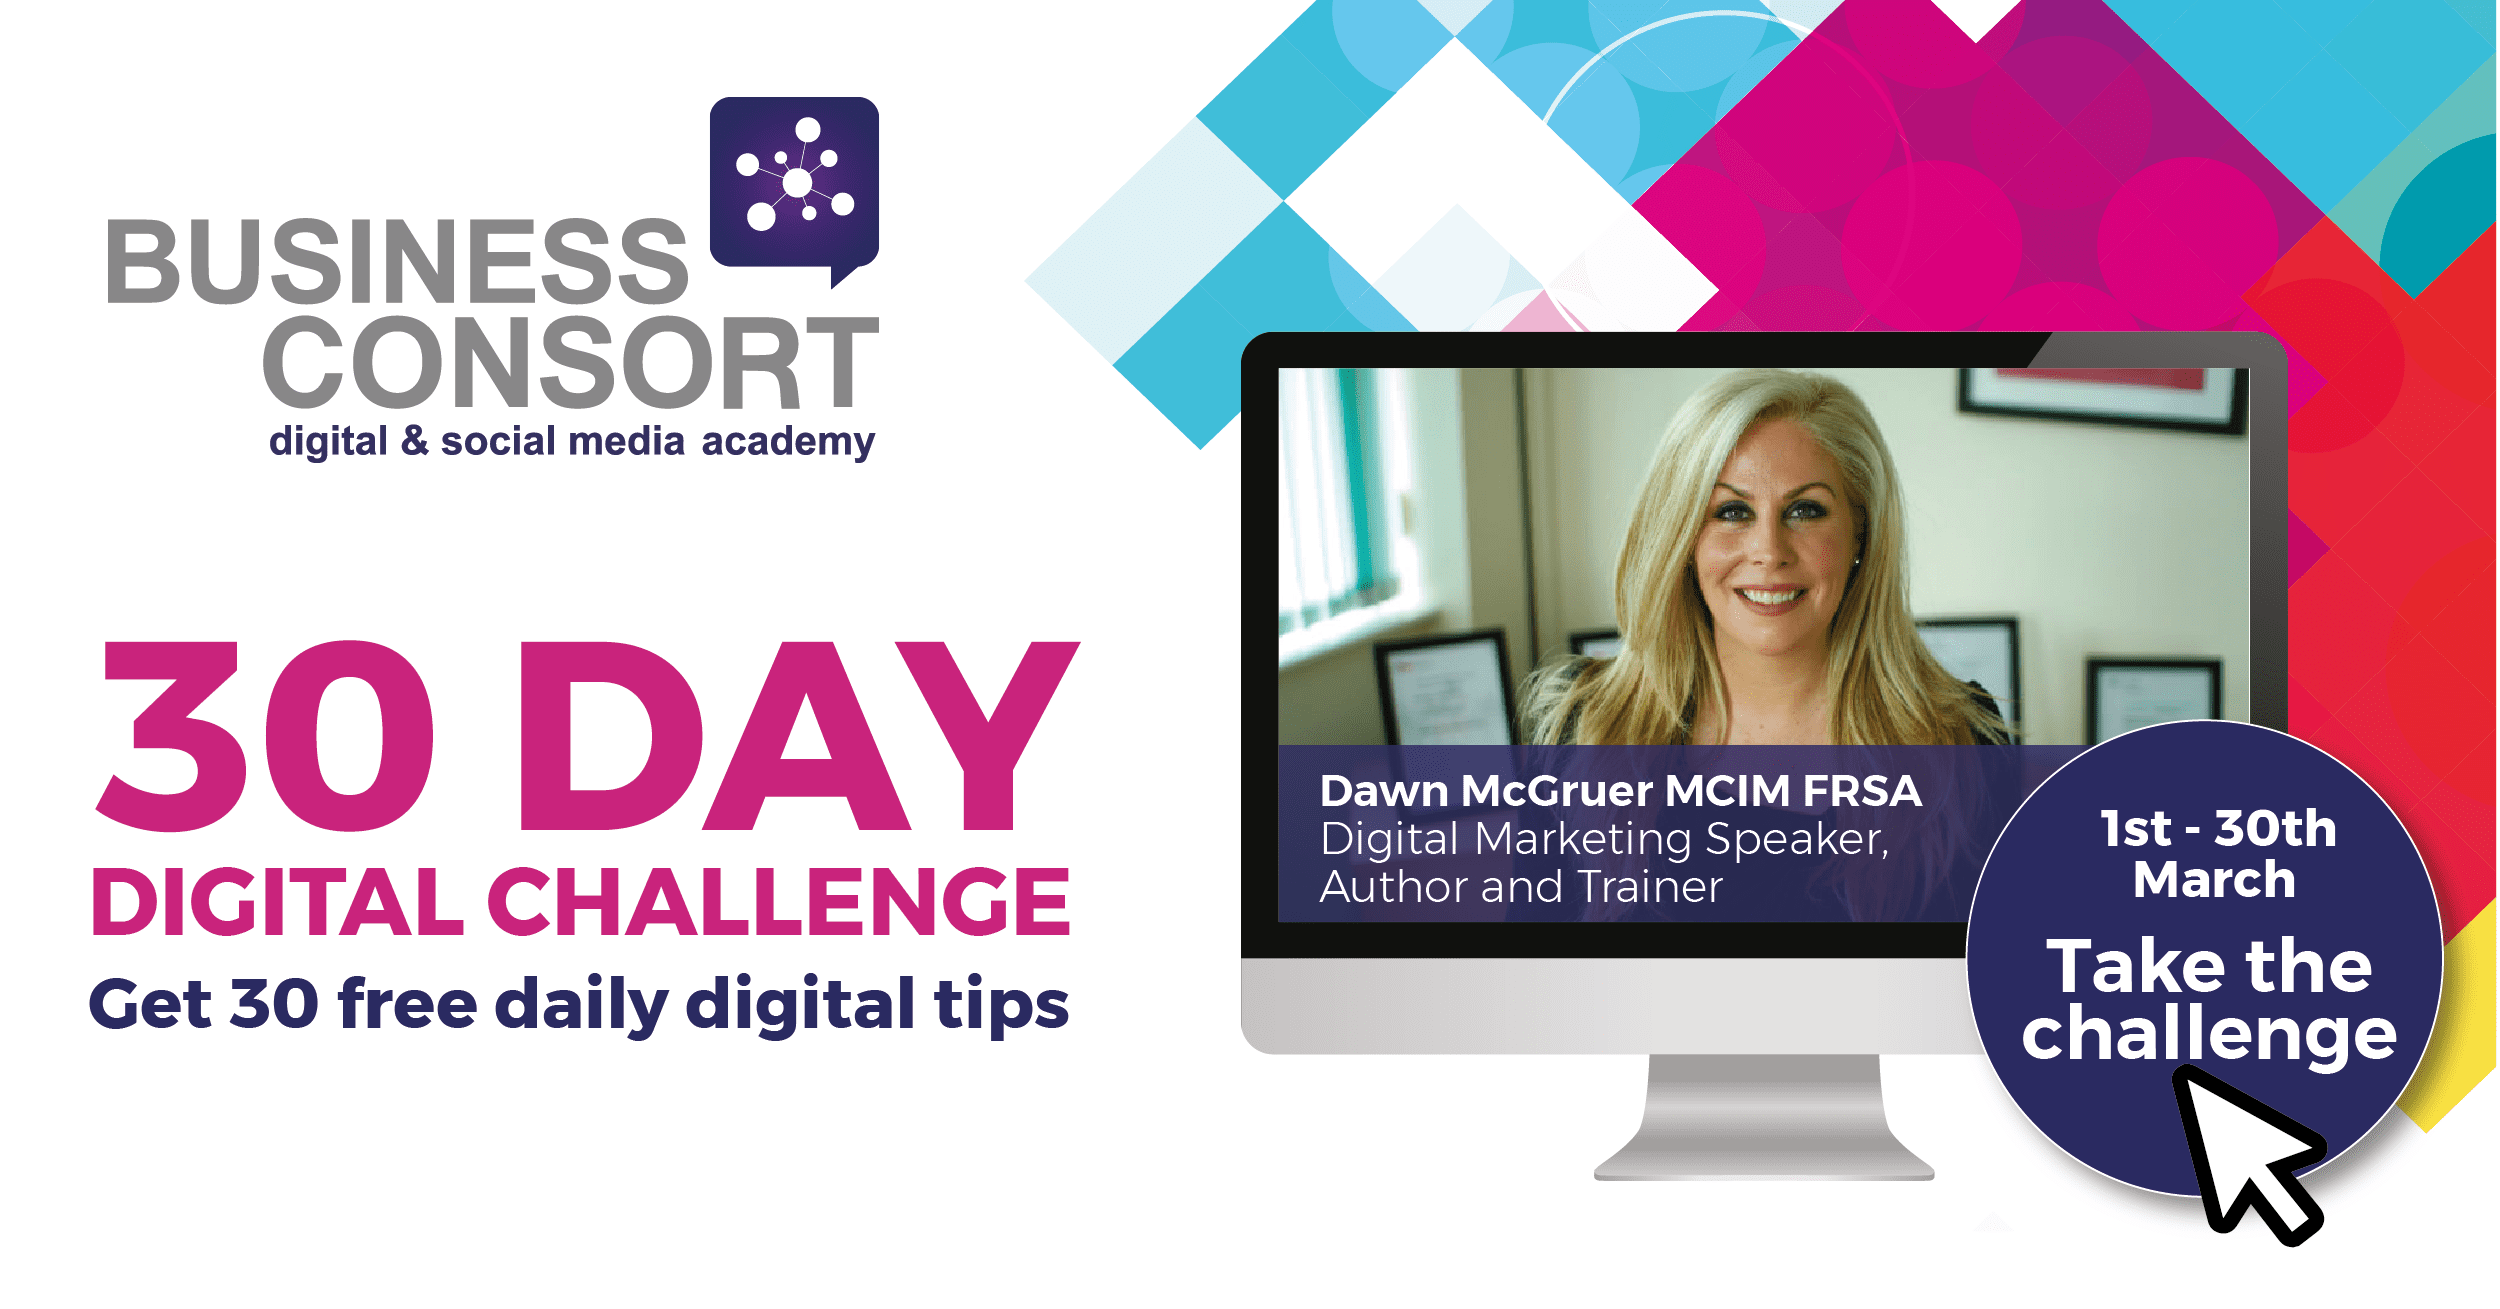 30 day digital challenge